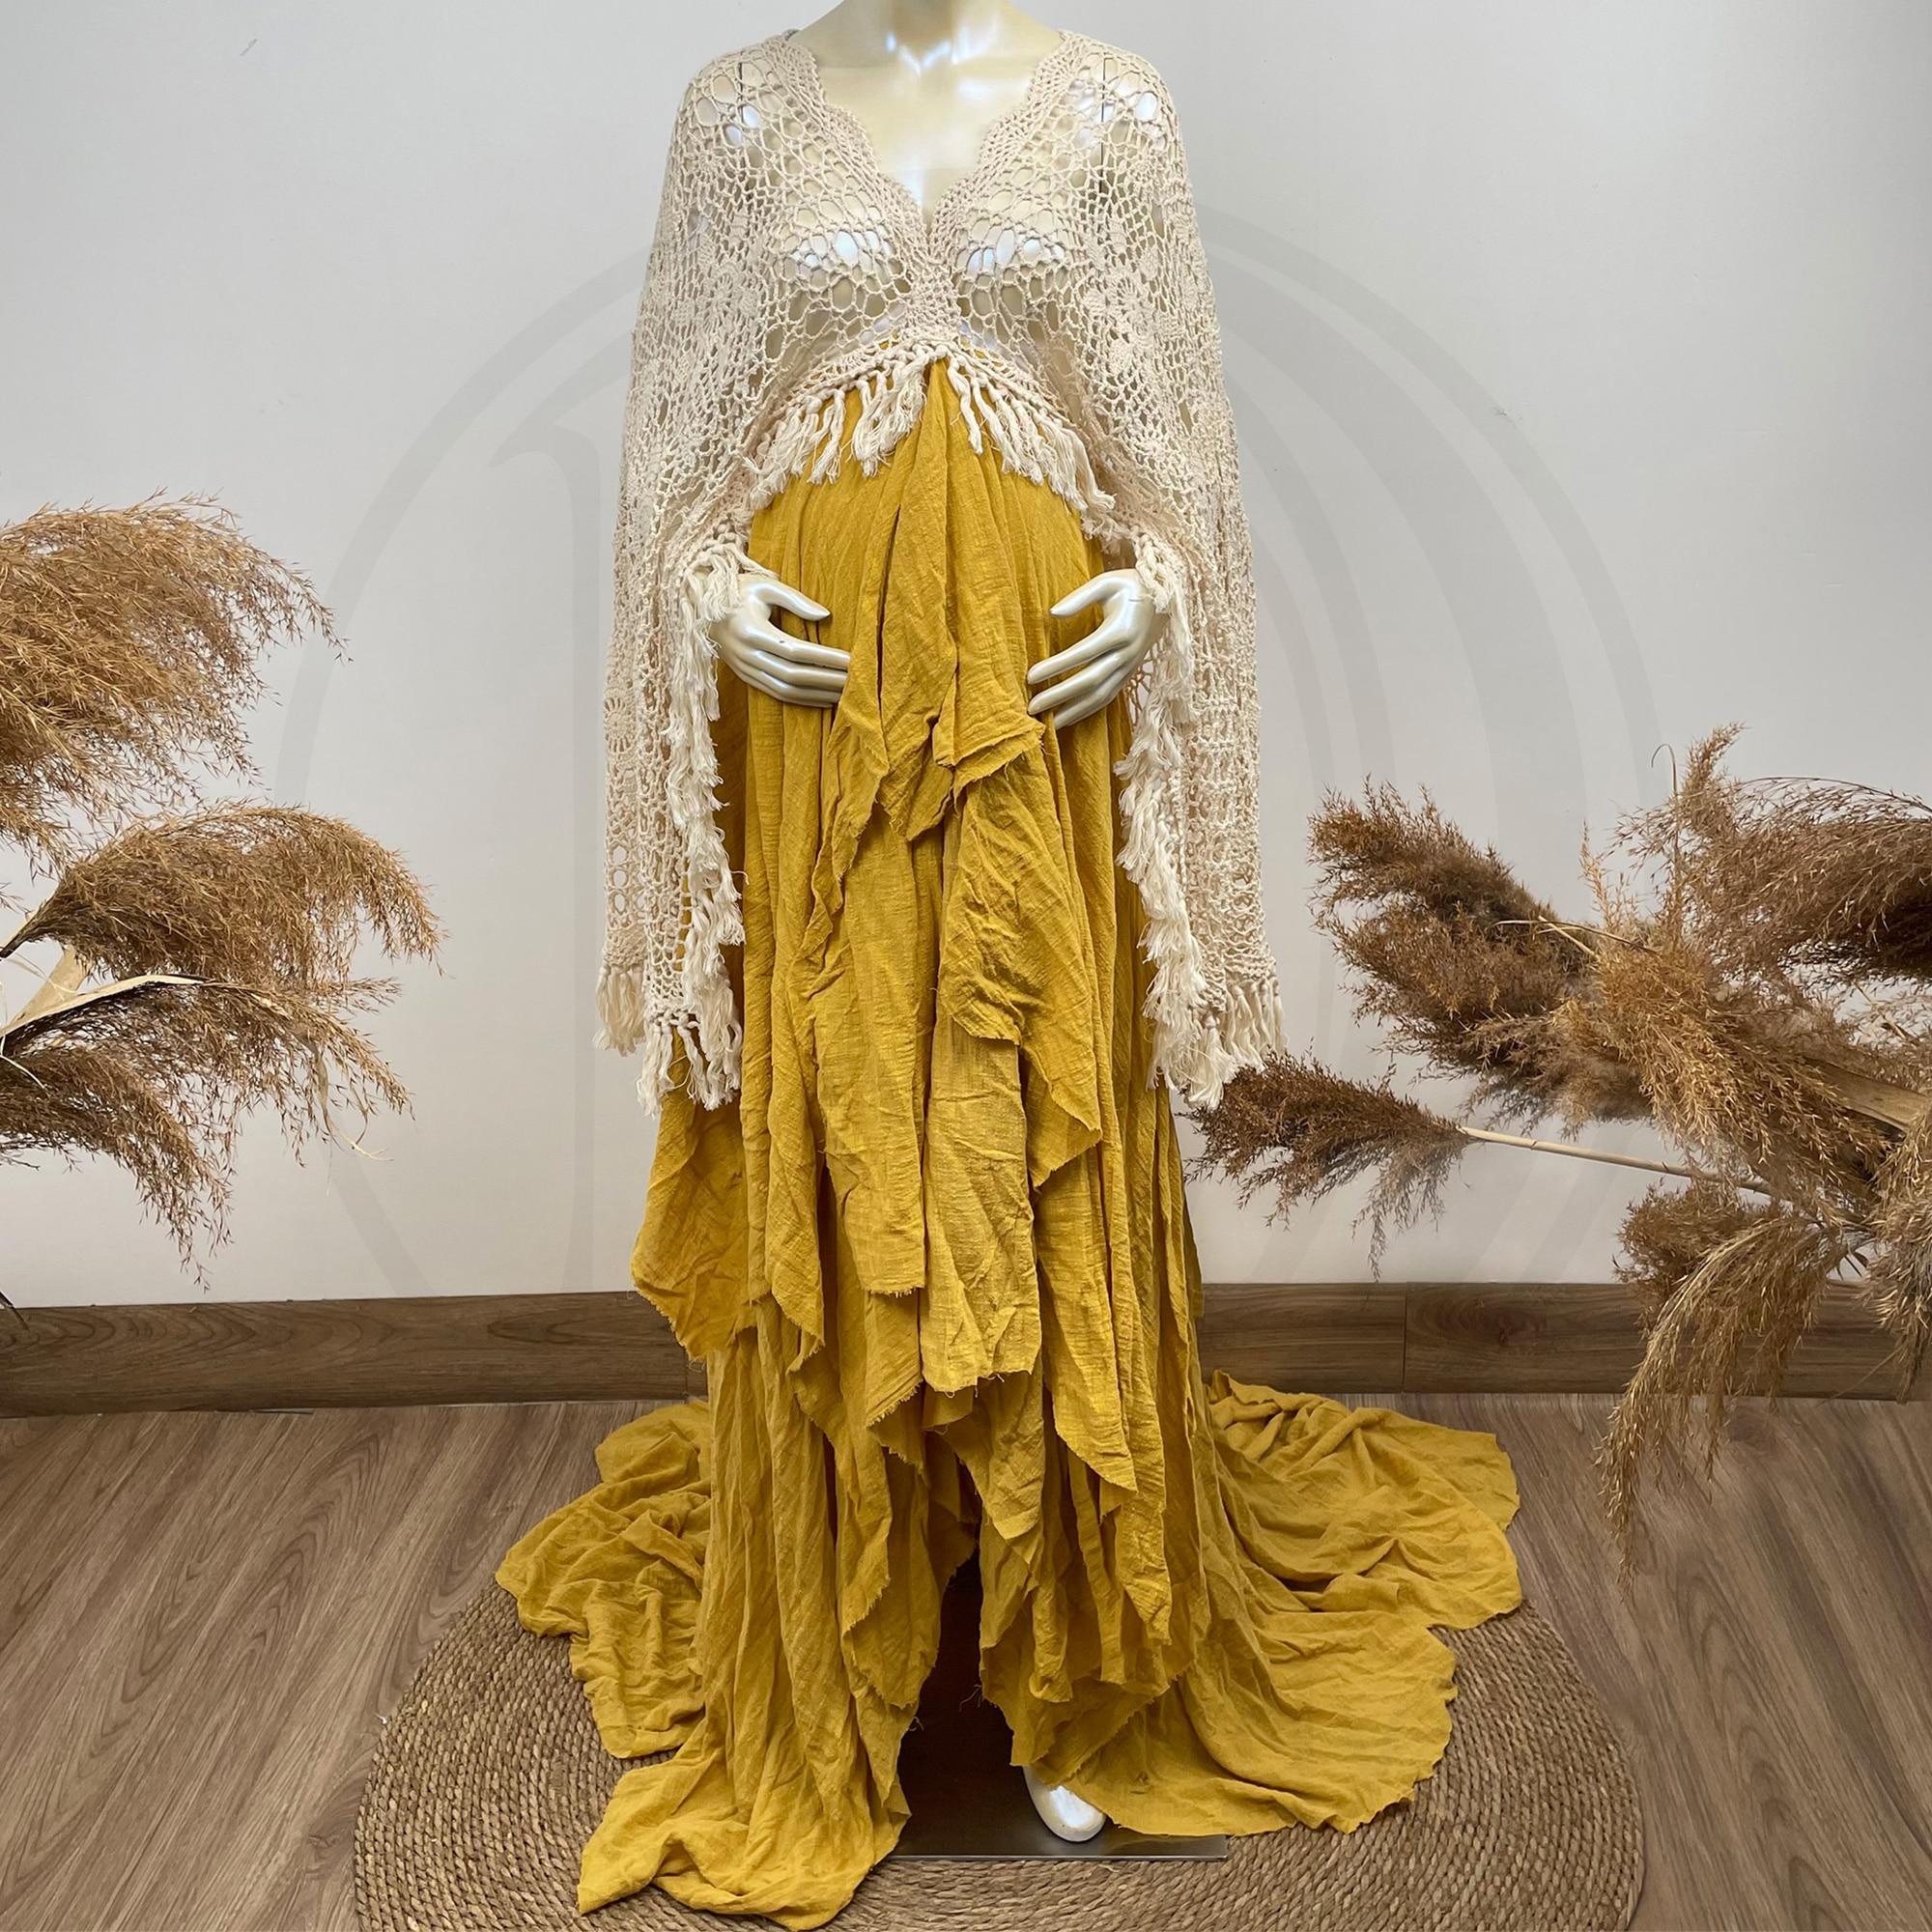 Crochet Kaftan Boho Cotton Photo Shoot Long Sleeves Robe Maternity Dress Evening Party Costume for Women Photography Accessories